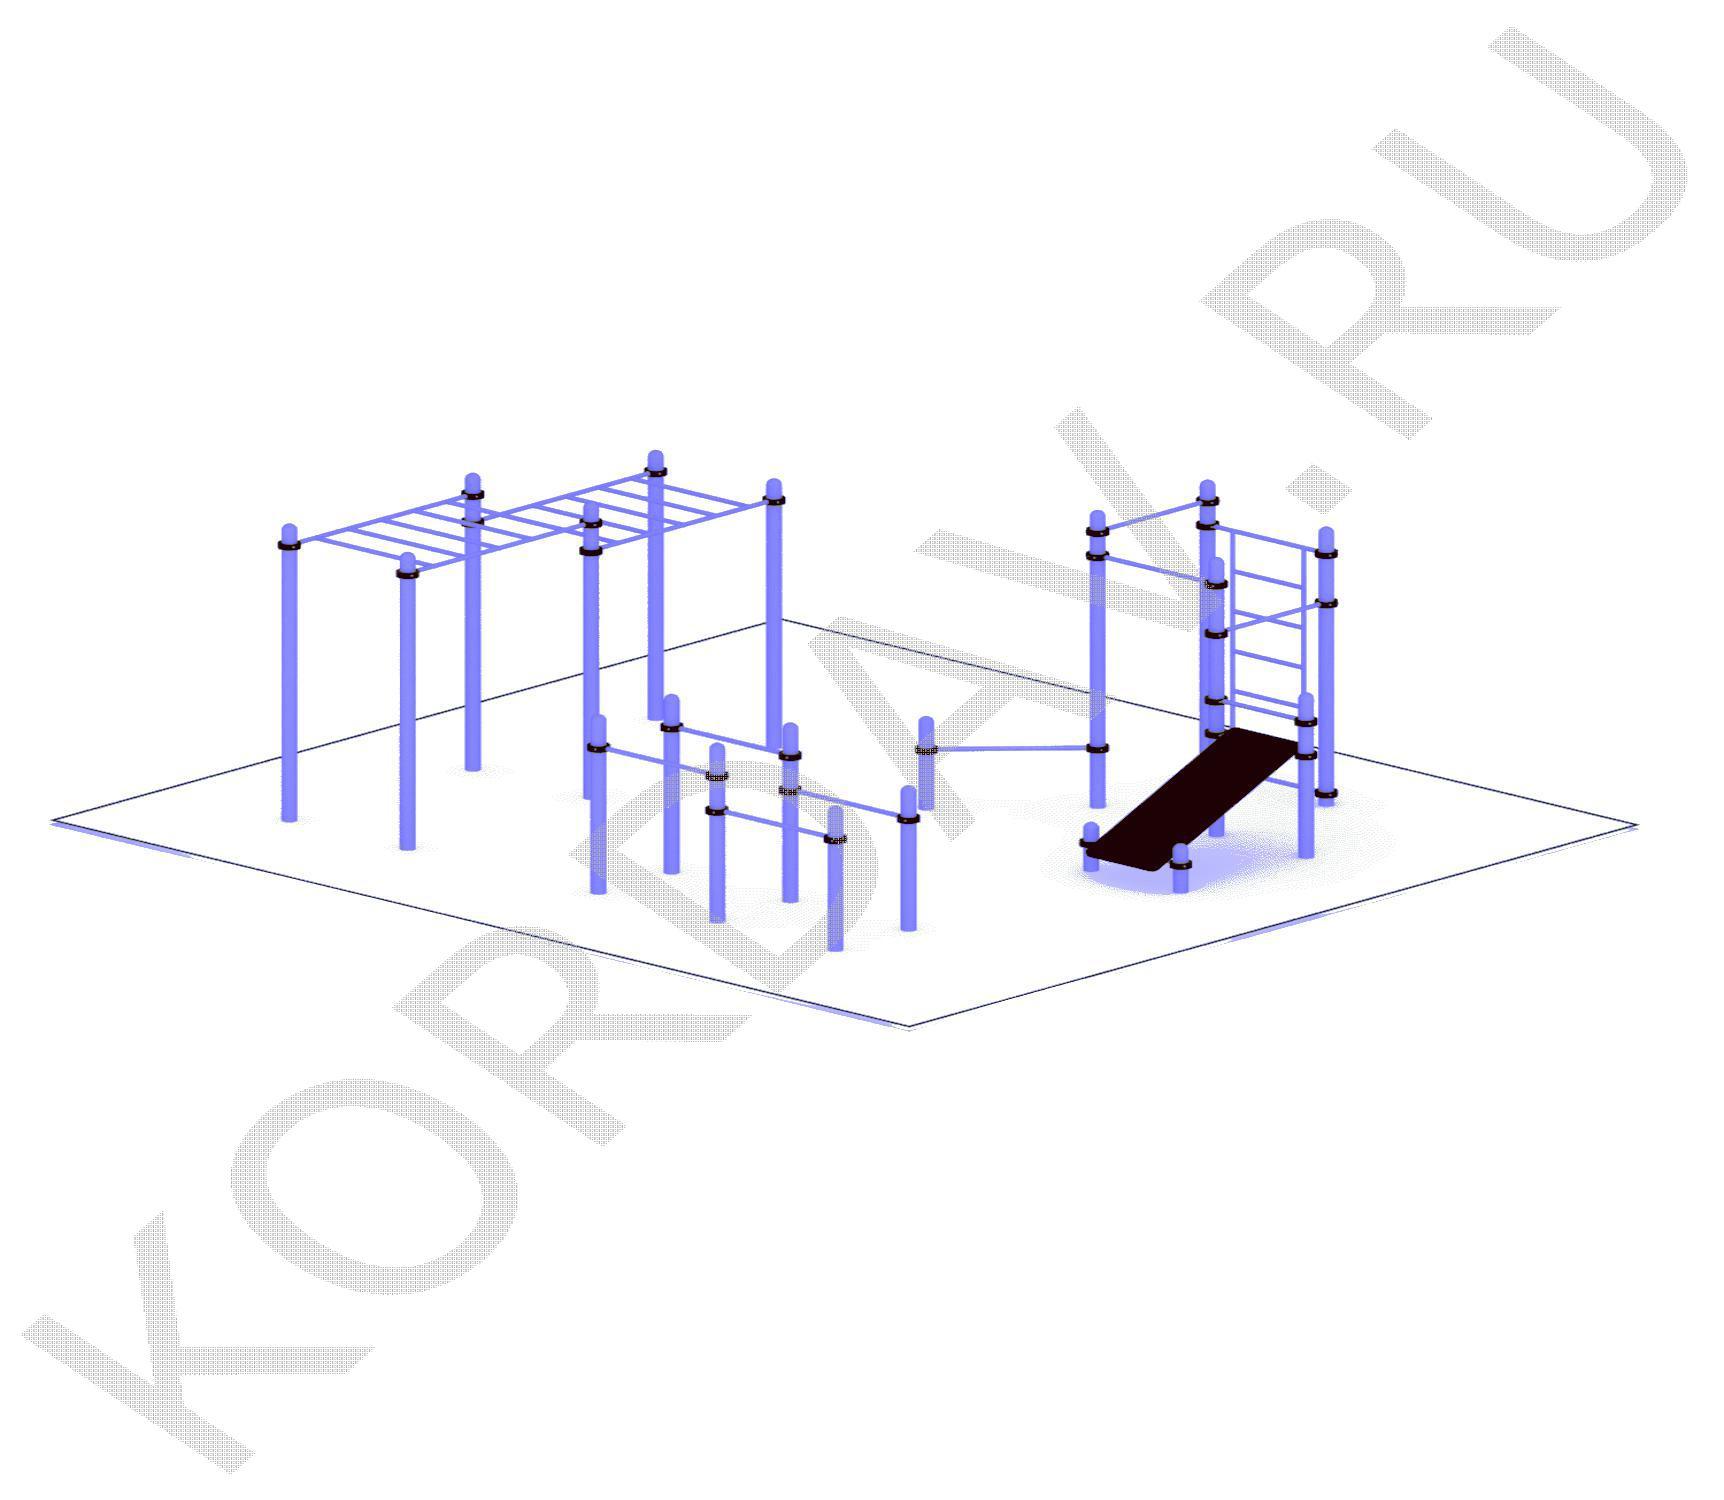 Рукоход, скамья, турники, шведская стенка, брусья (89 труба) СТ 1.571